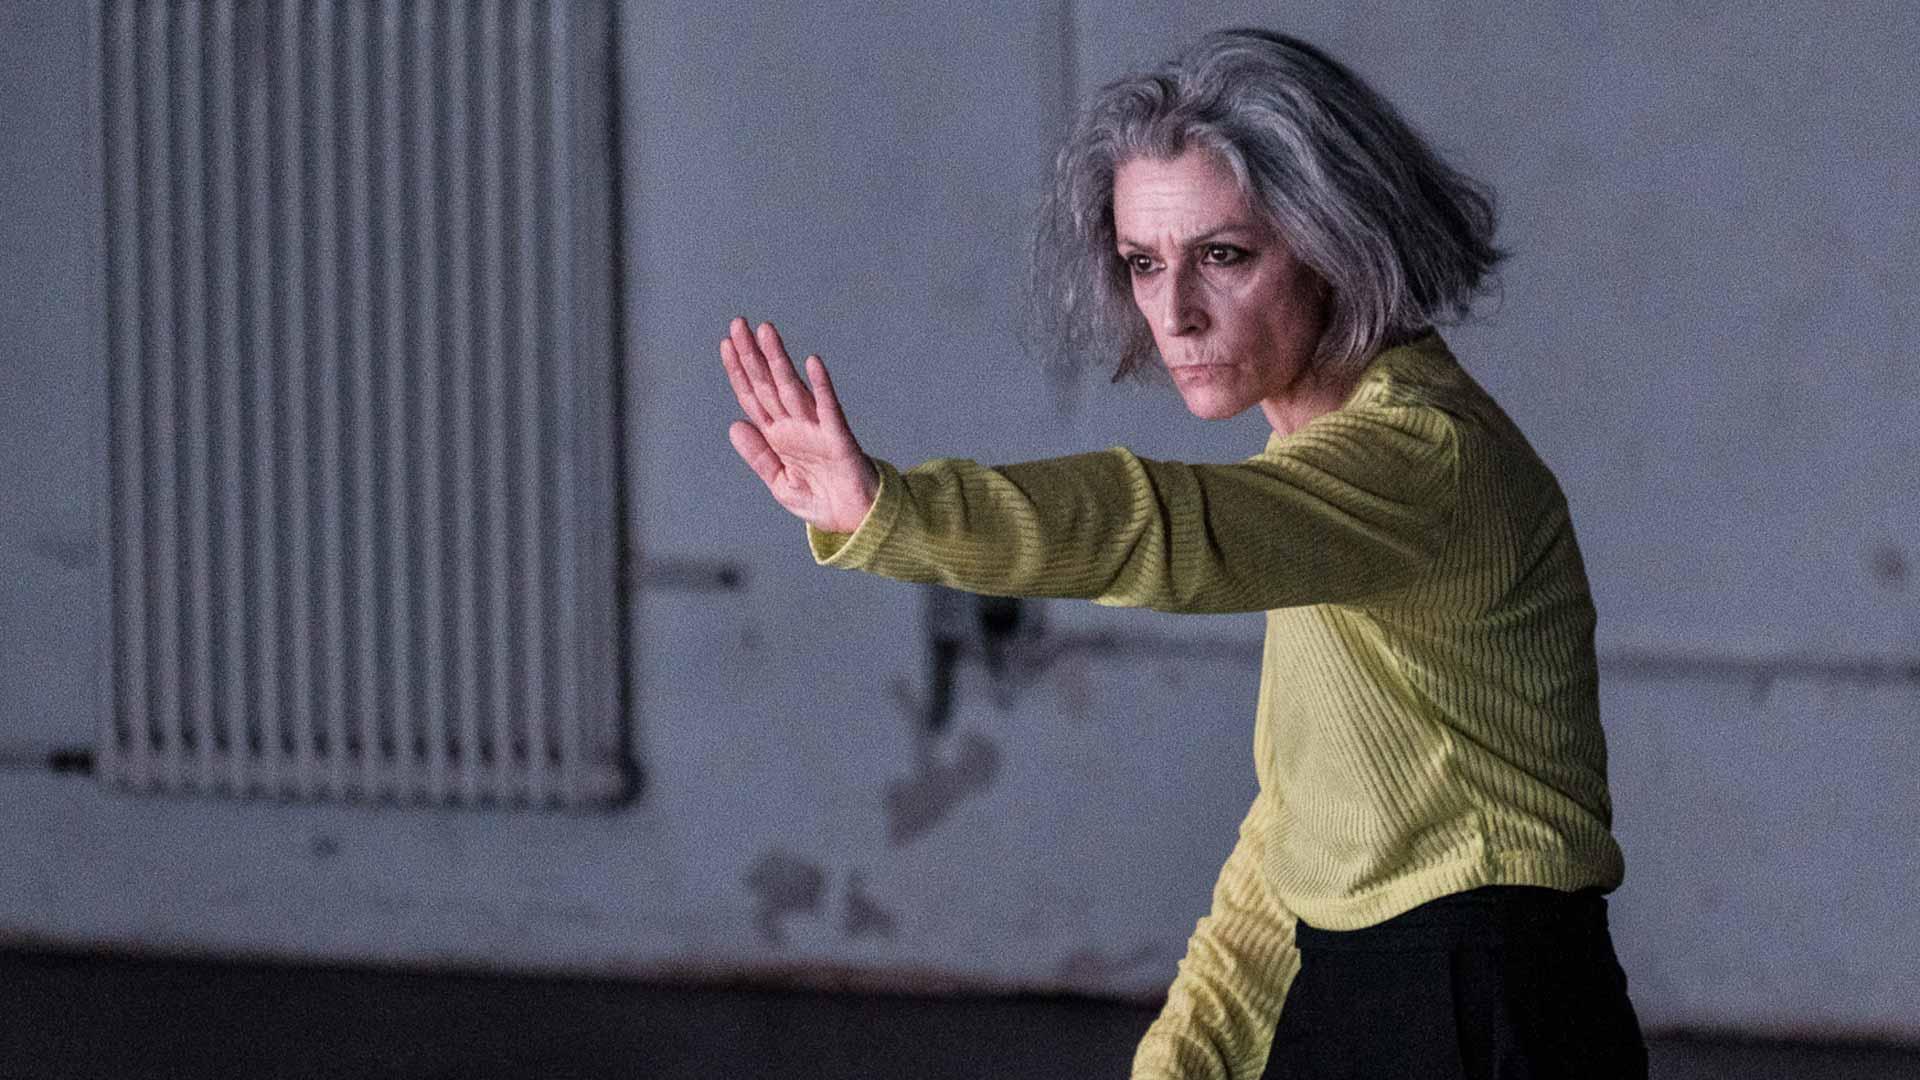 Dansaren Cristina Caprioli sträcker ut en arm